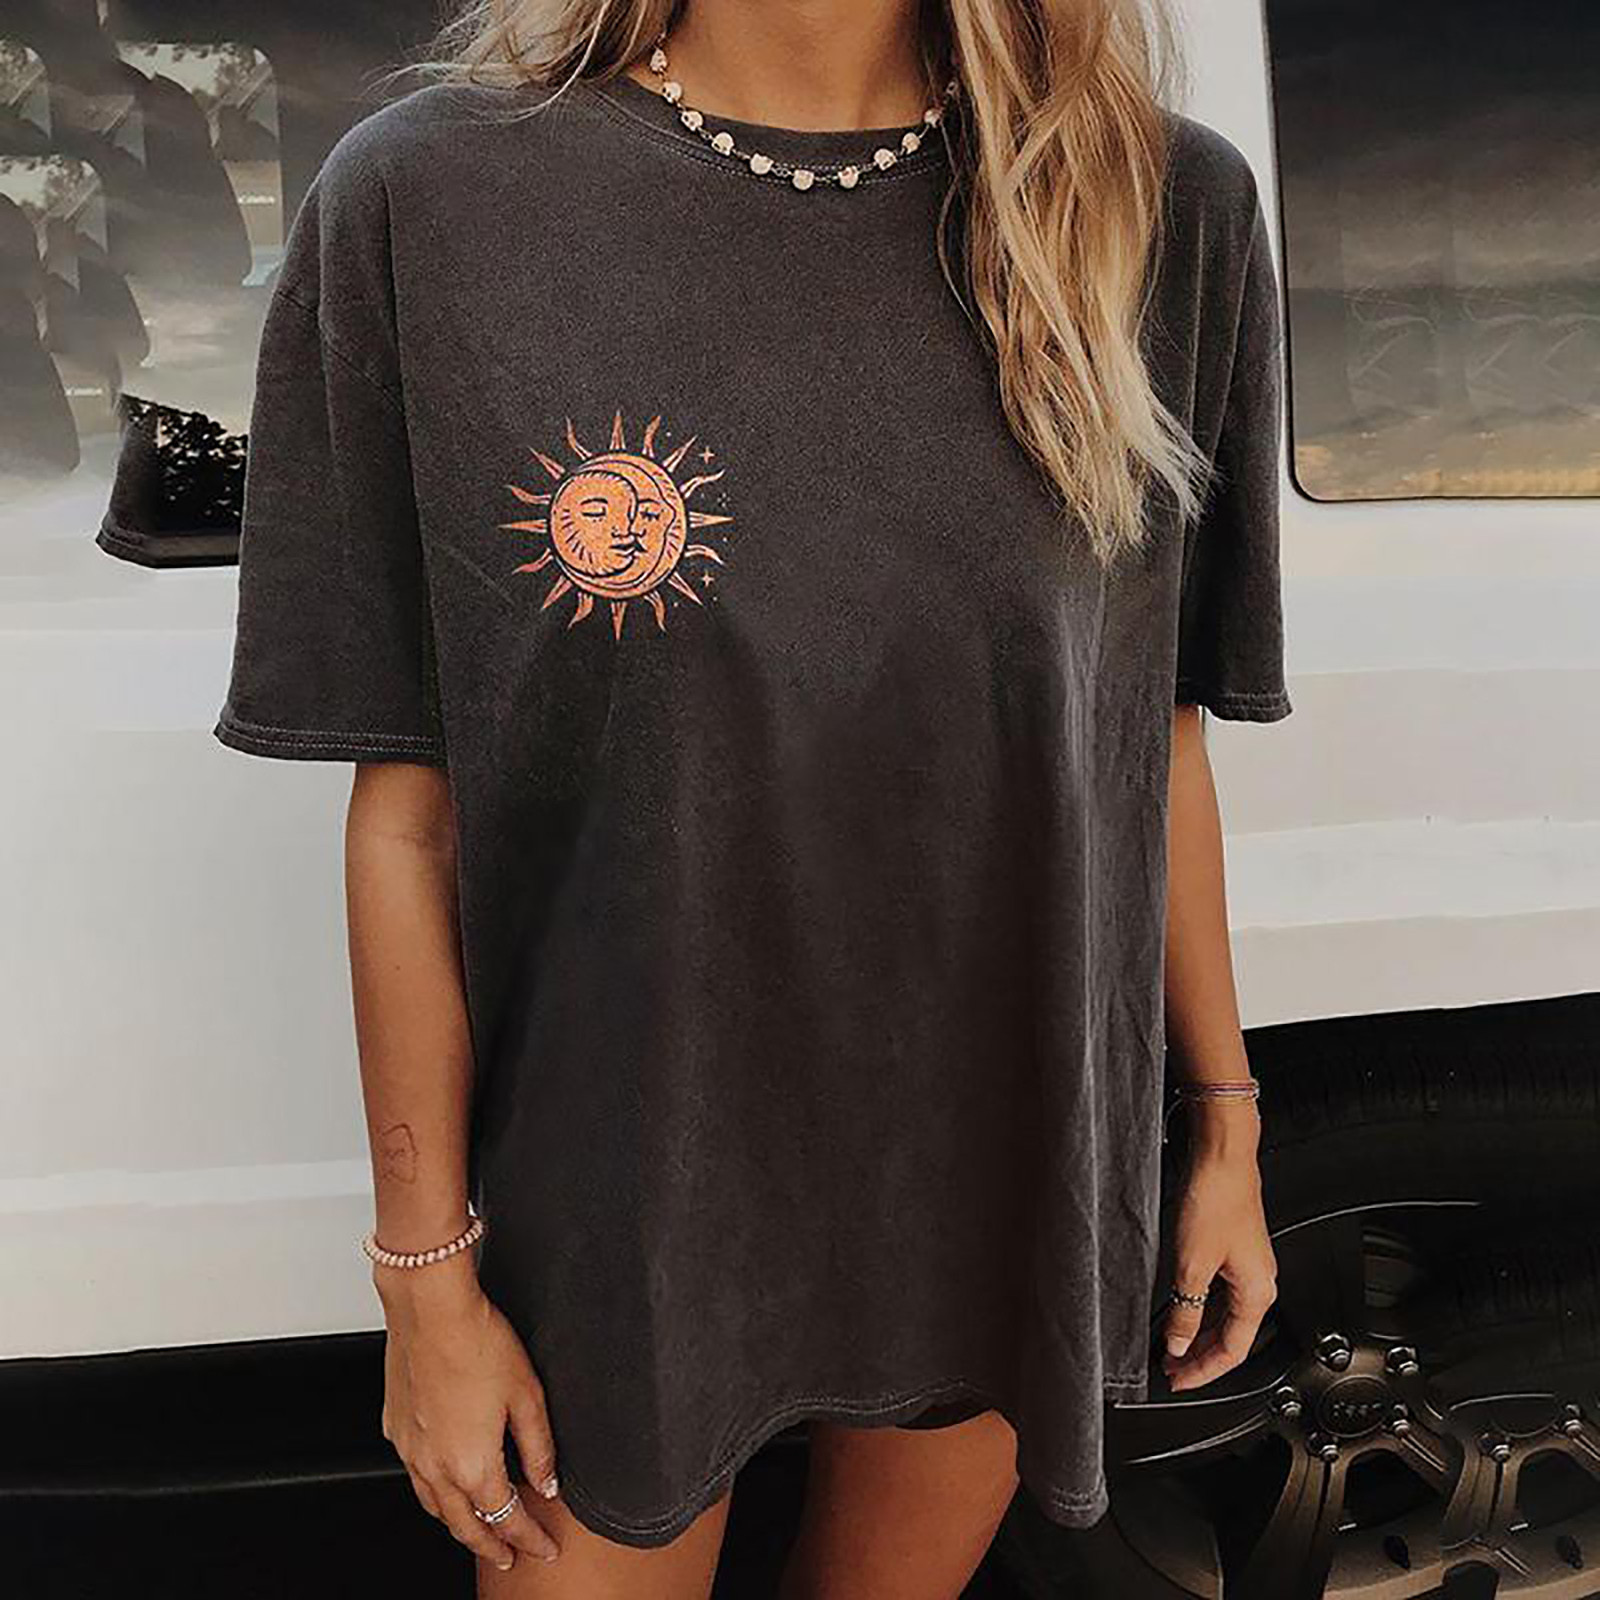 Vintage Sun And Moon Printed Pattern Tee Shirt  2